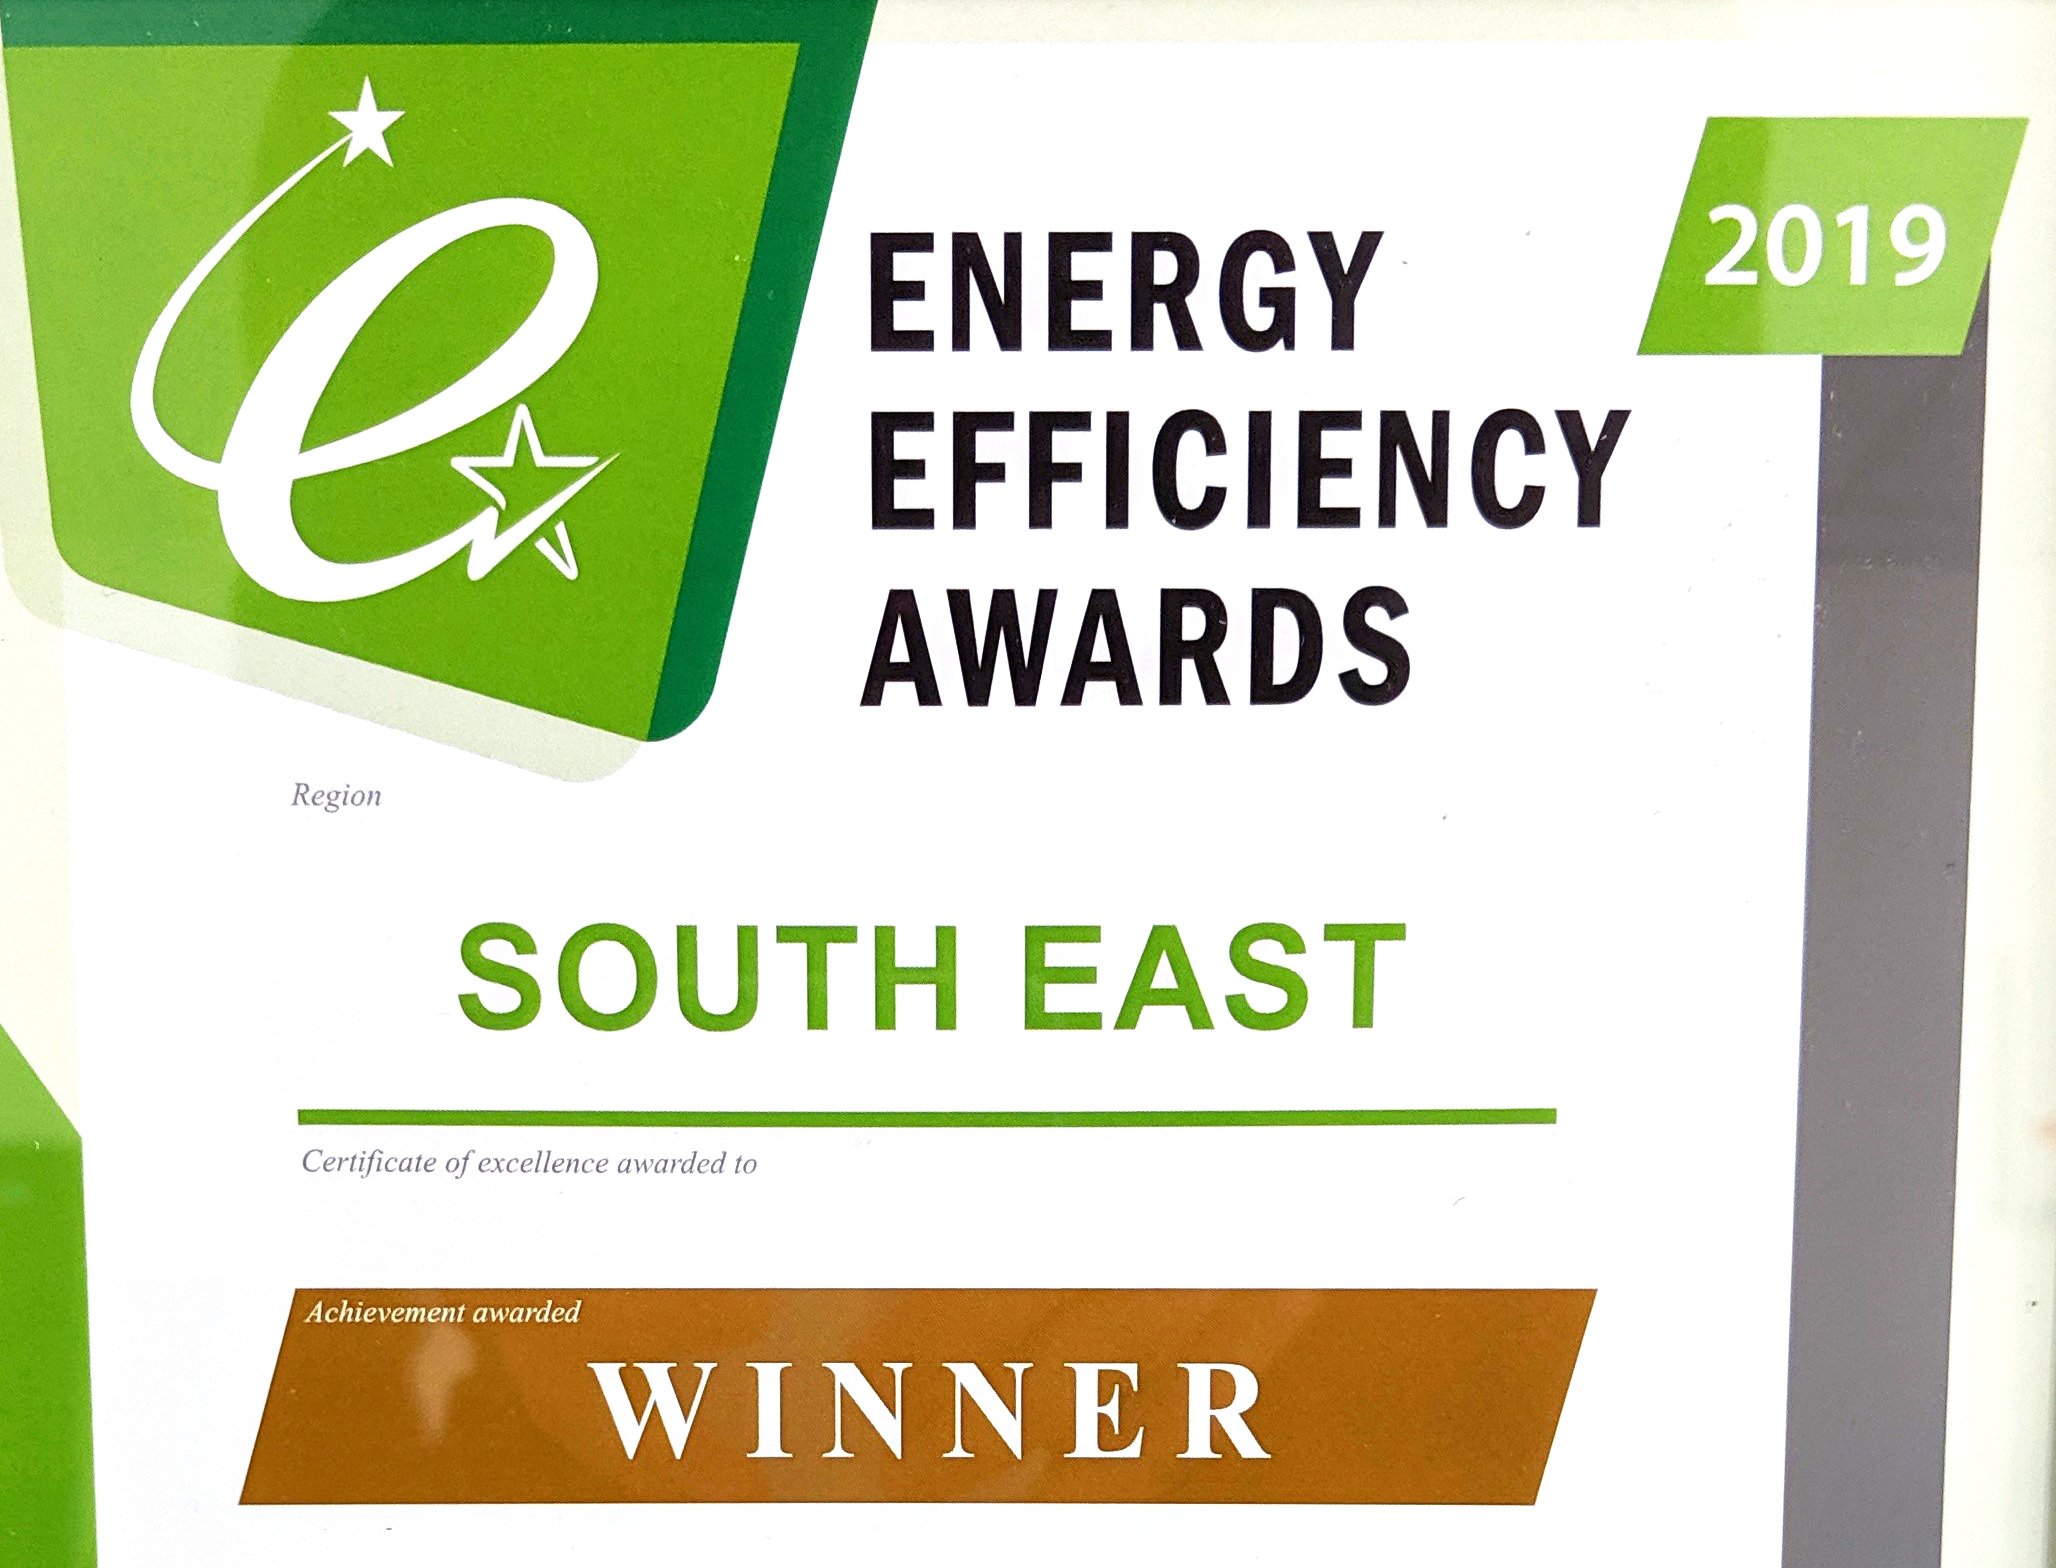 Energy Efficiency Awards 2019